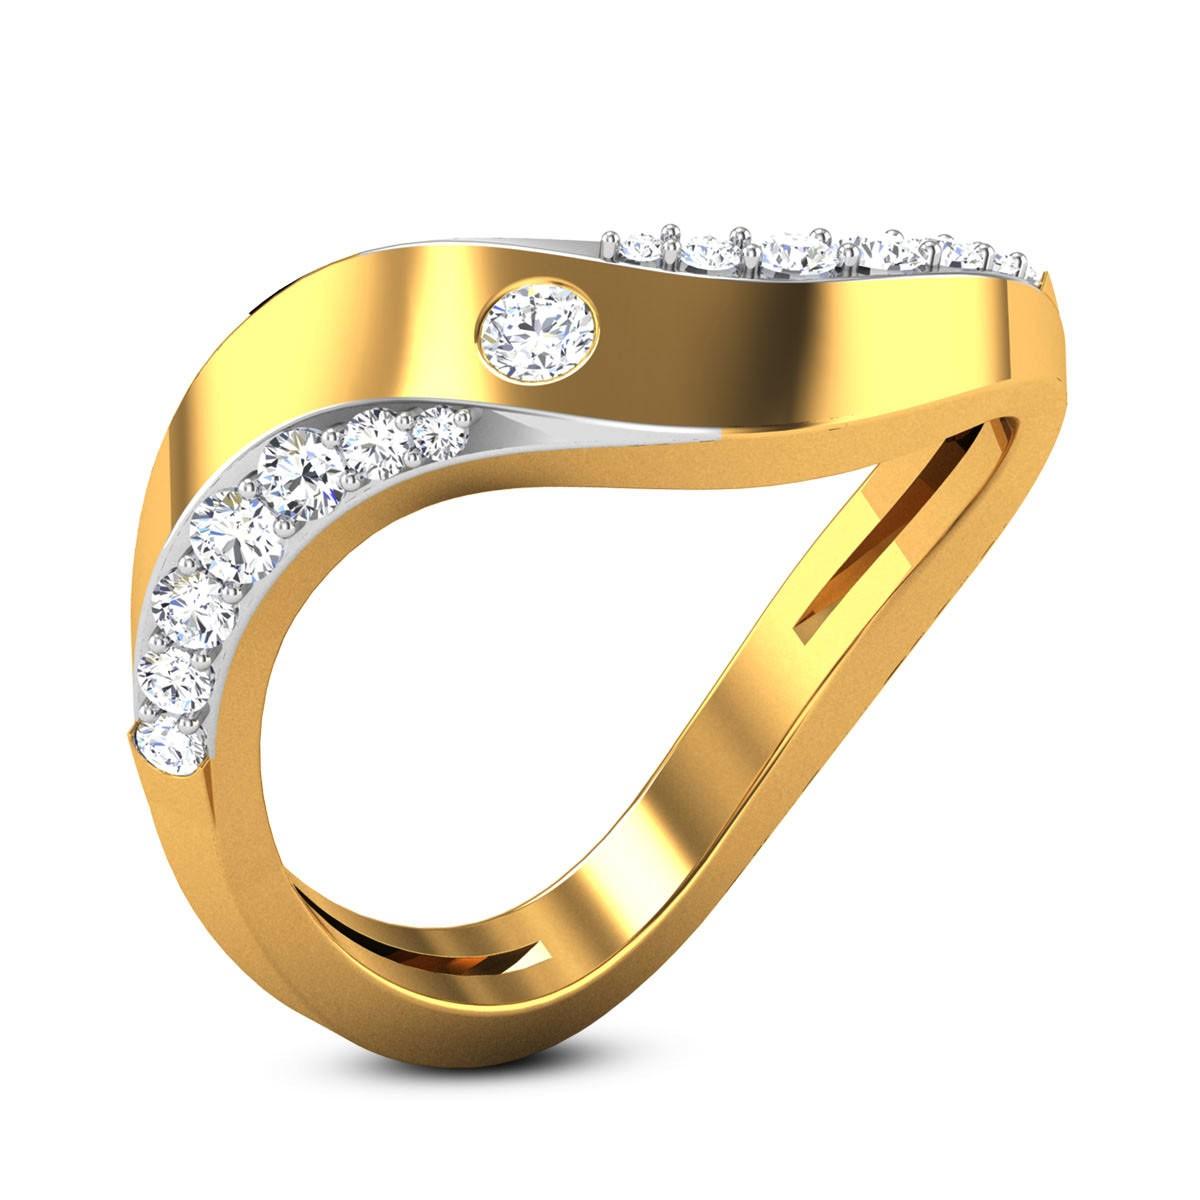 Pierre Wavy Diamond Ring